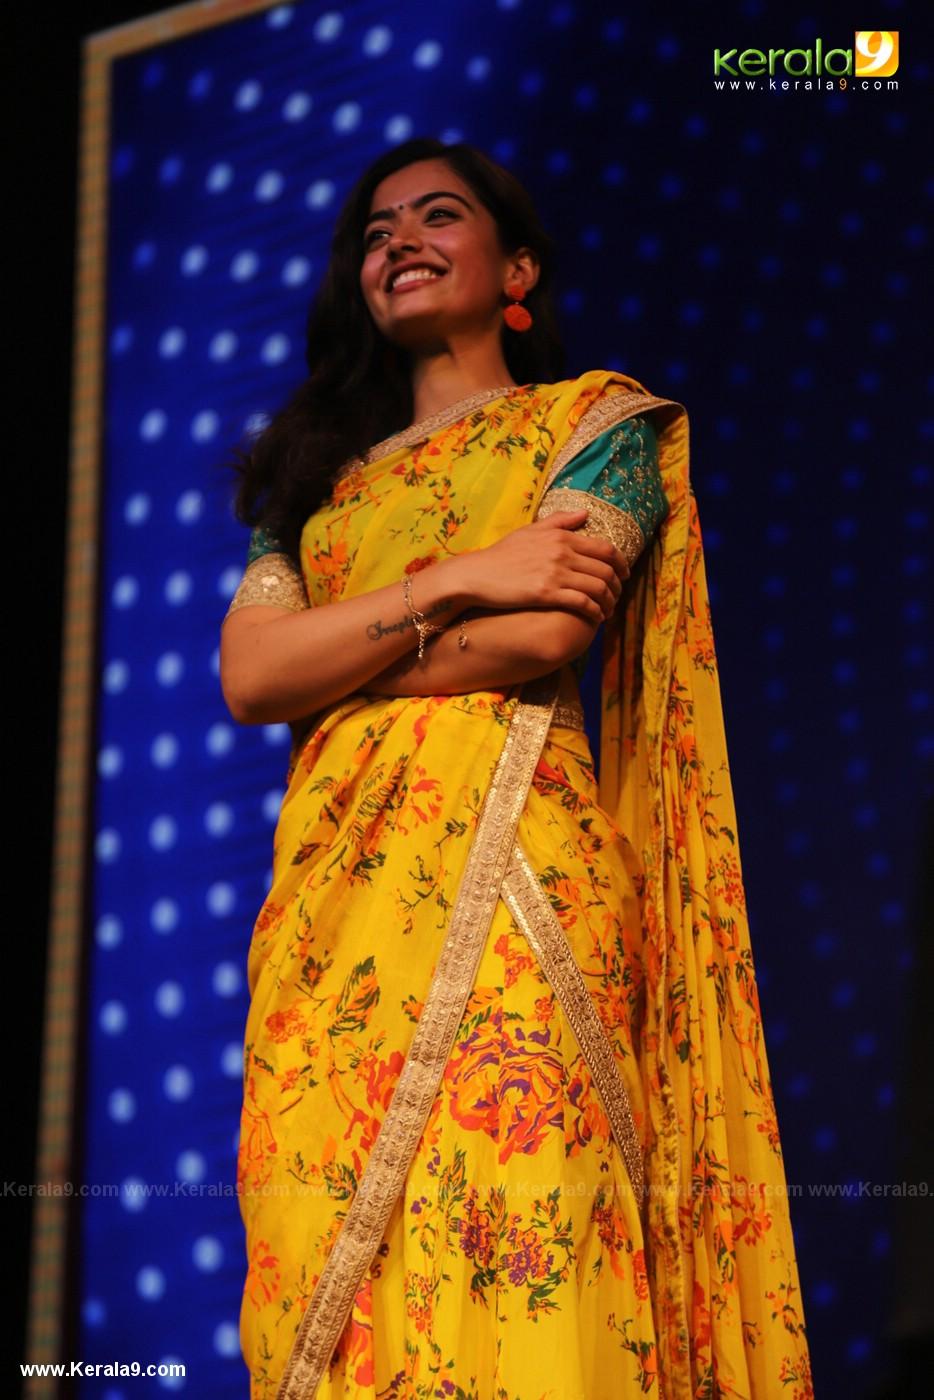 Rashmika at Dear Comrade movie premotion kerala kochi photos 022 1 - Kerala9.com